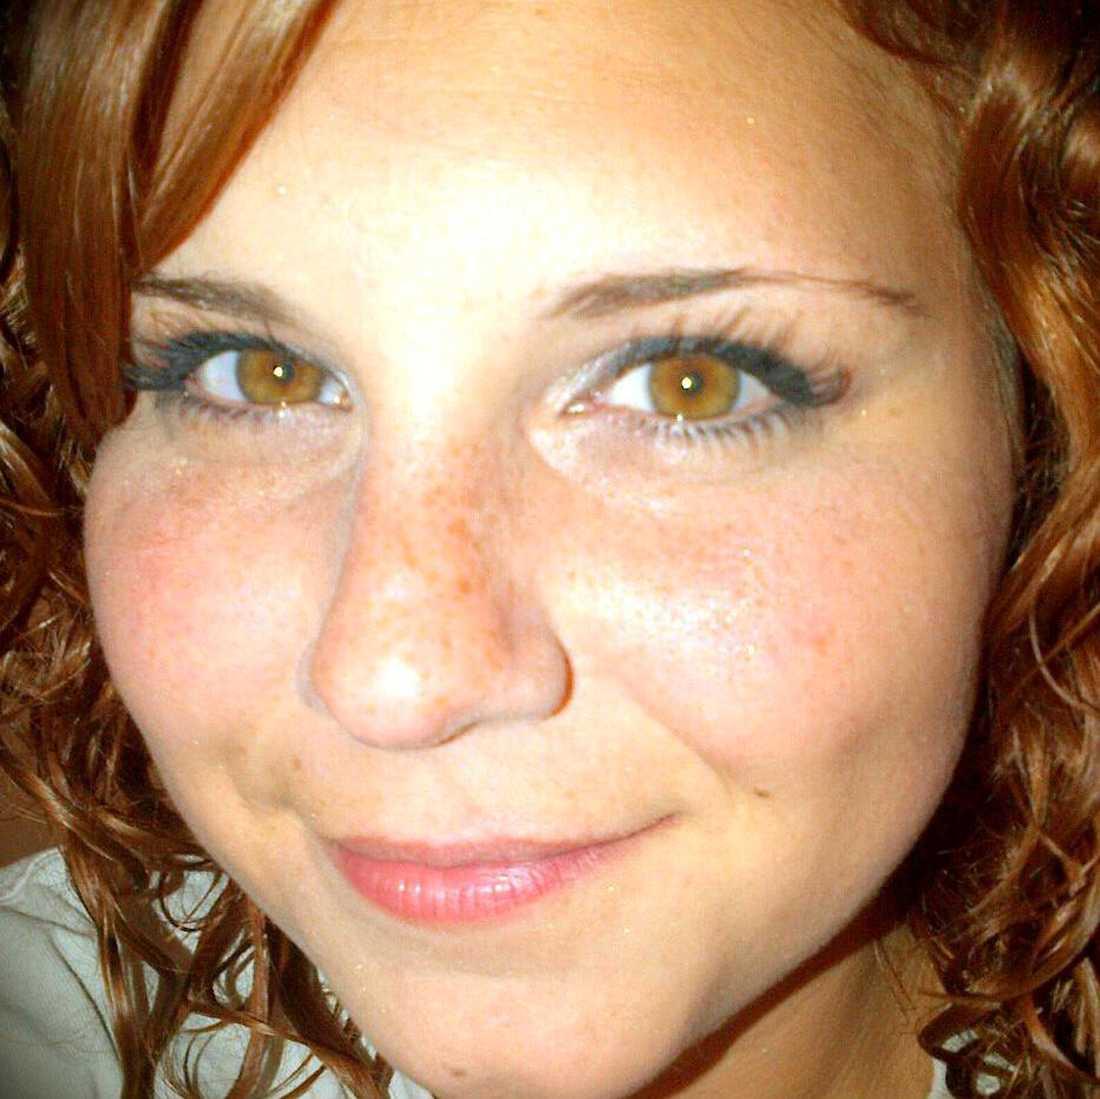 Heather Heyes blev 32. Hon dödades i bilattacken i Charlottesville.